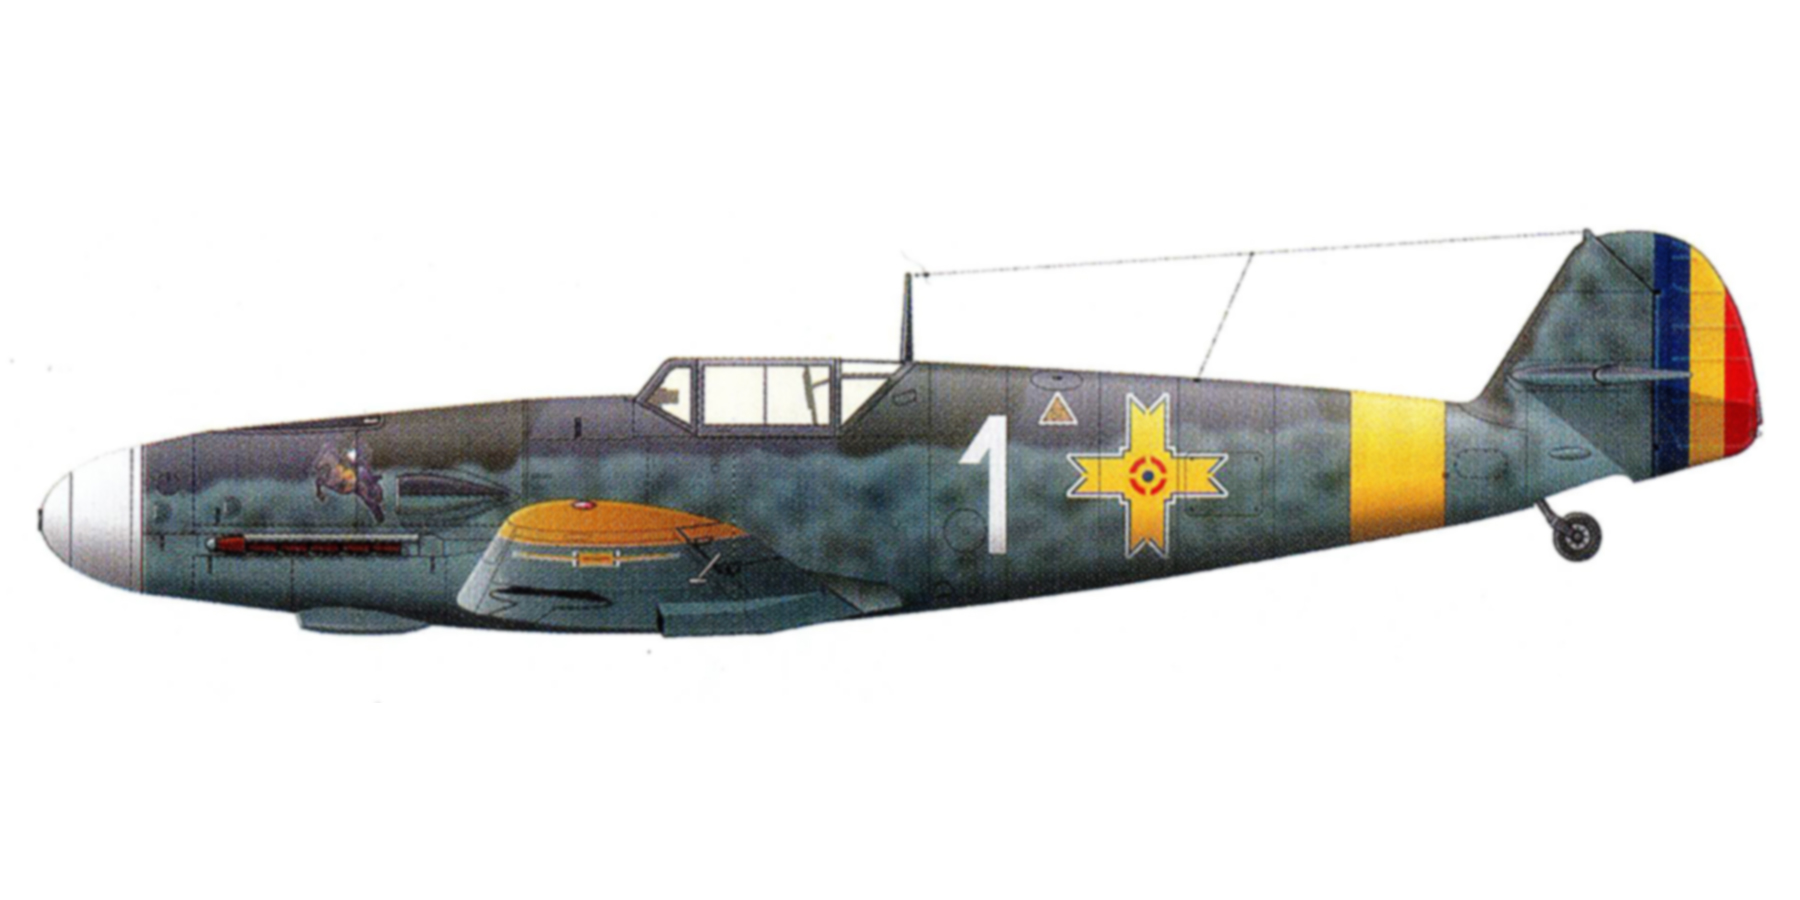 Messerschmitt Bf 109G2 RRAF 7FG White 1 Romania 1943 0B